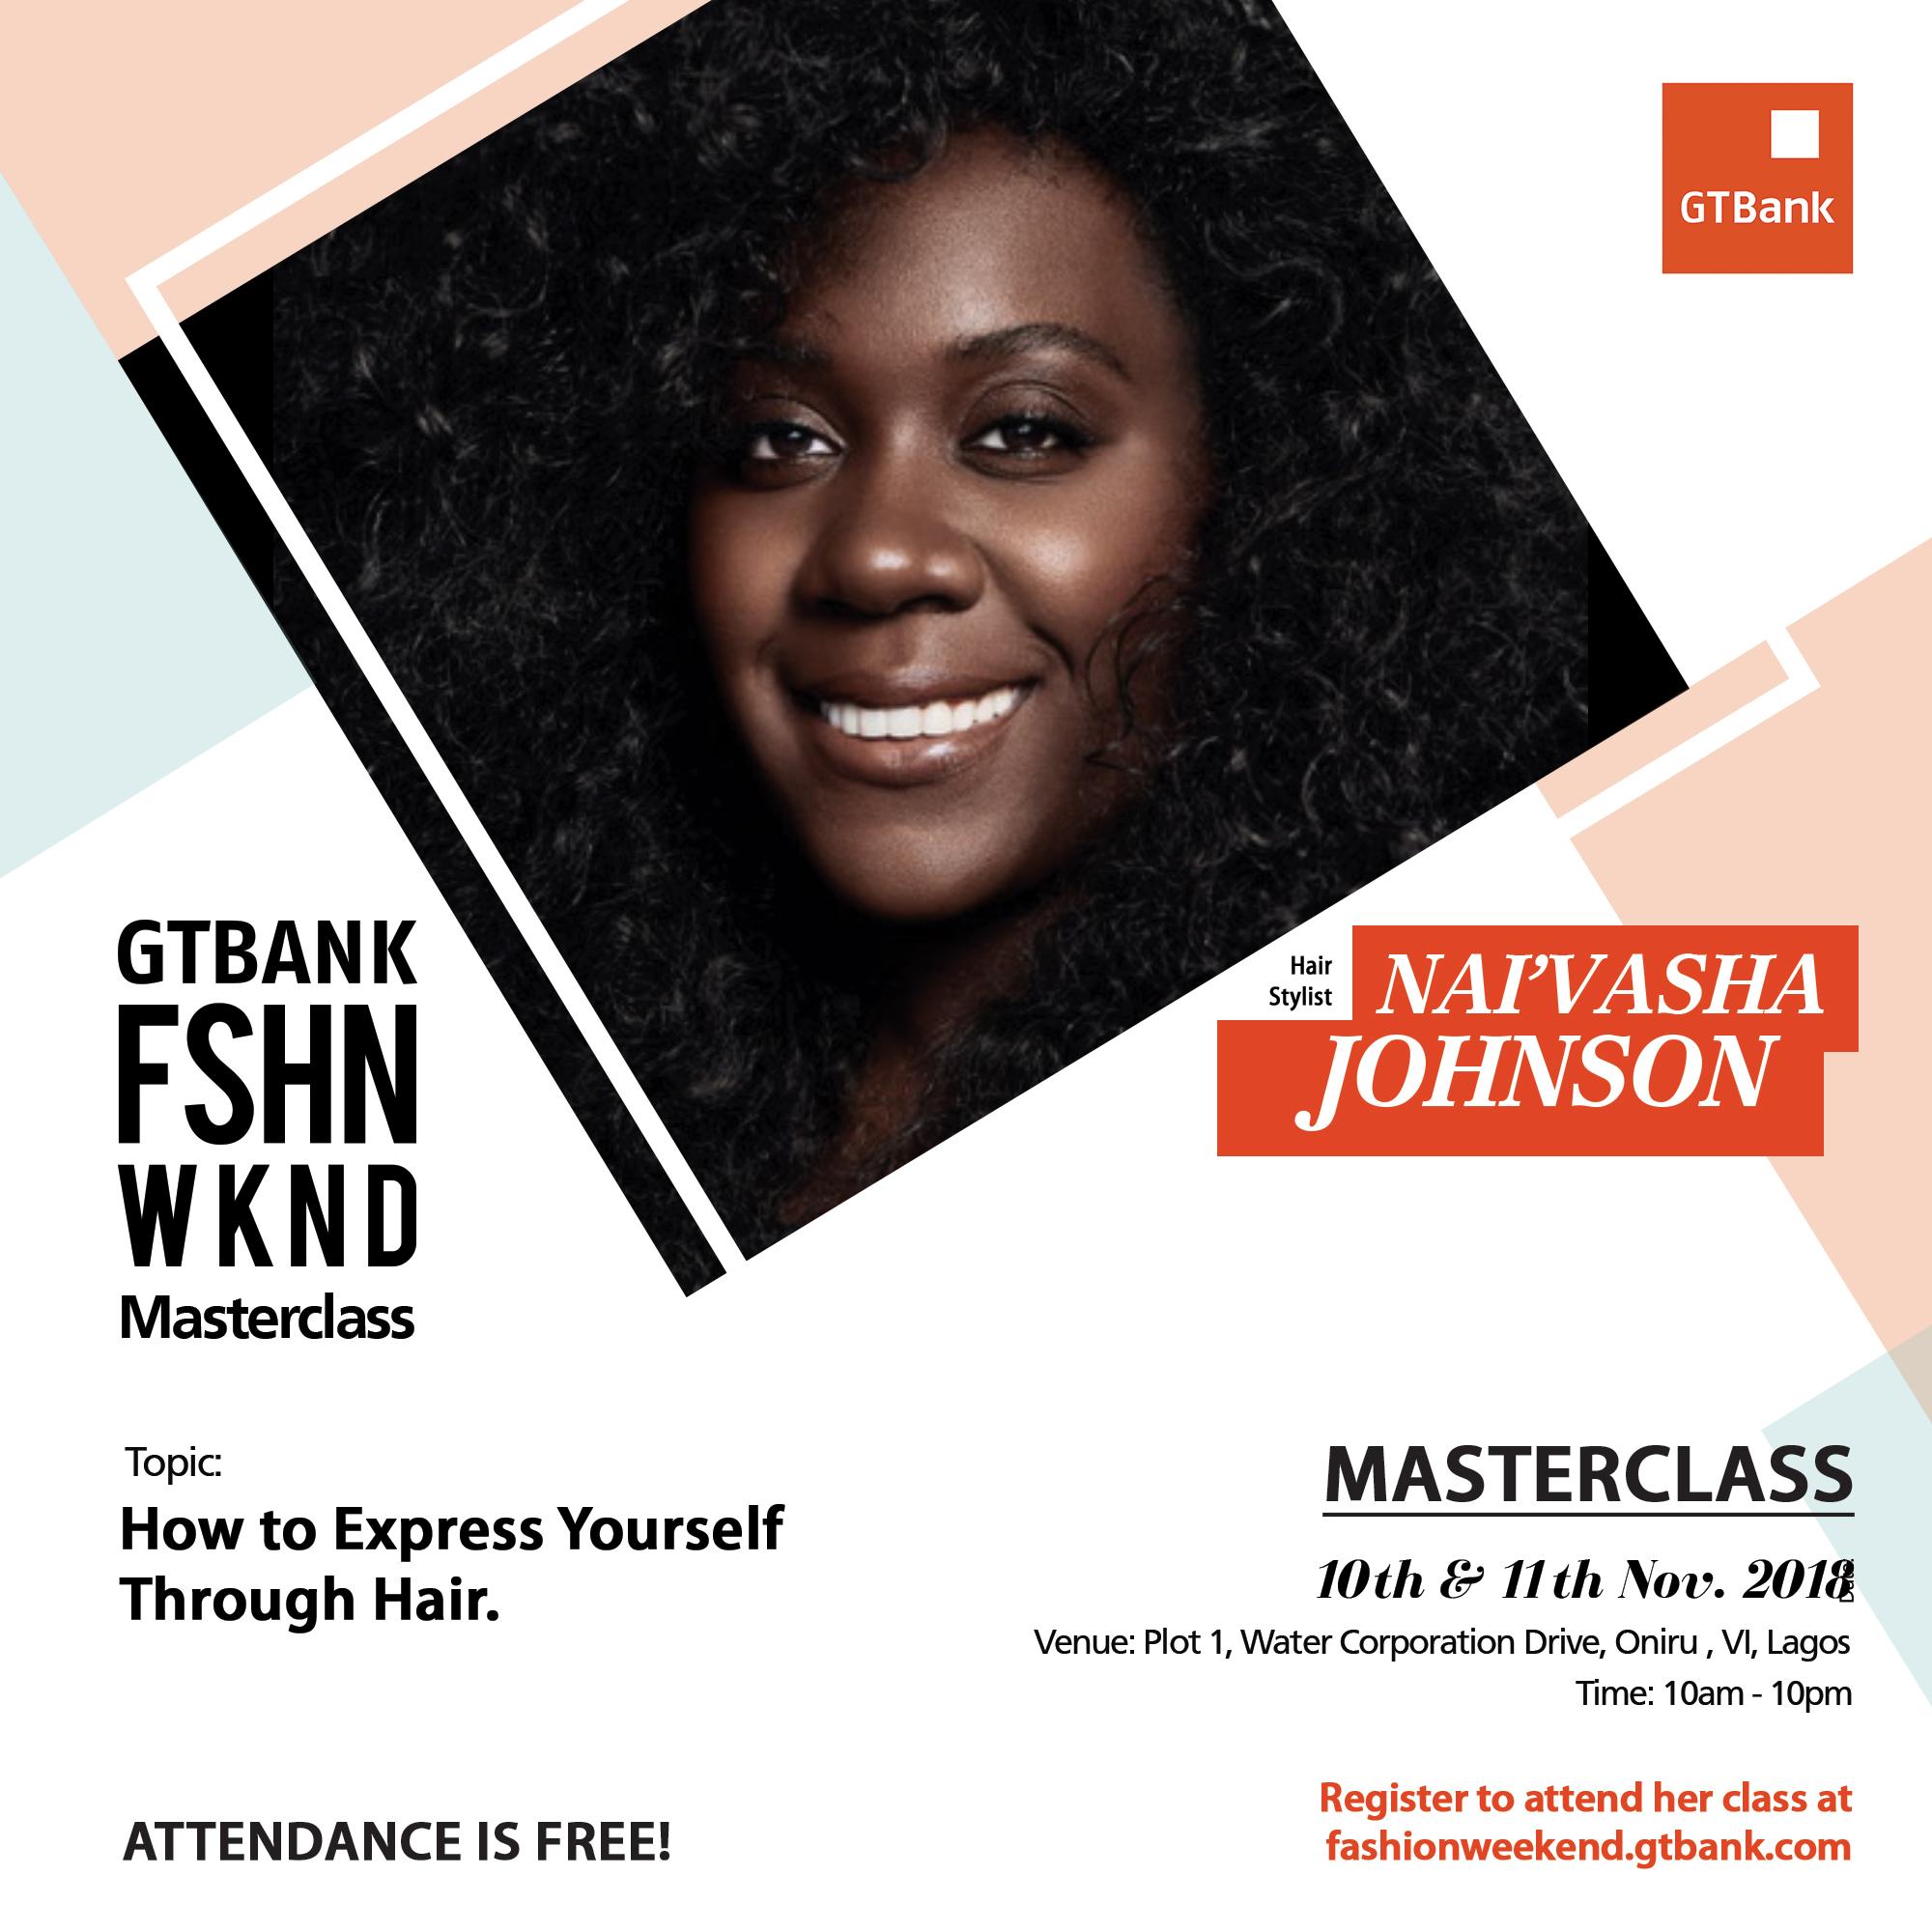 Hairstylist, Nai'vasha Johnson billed for GTBank Fashion Weekend Masterclass